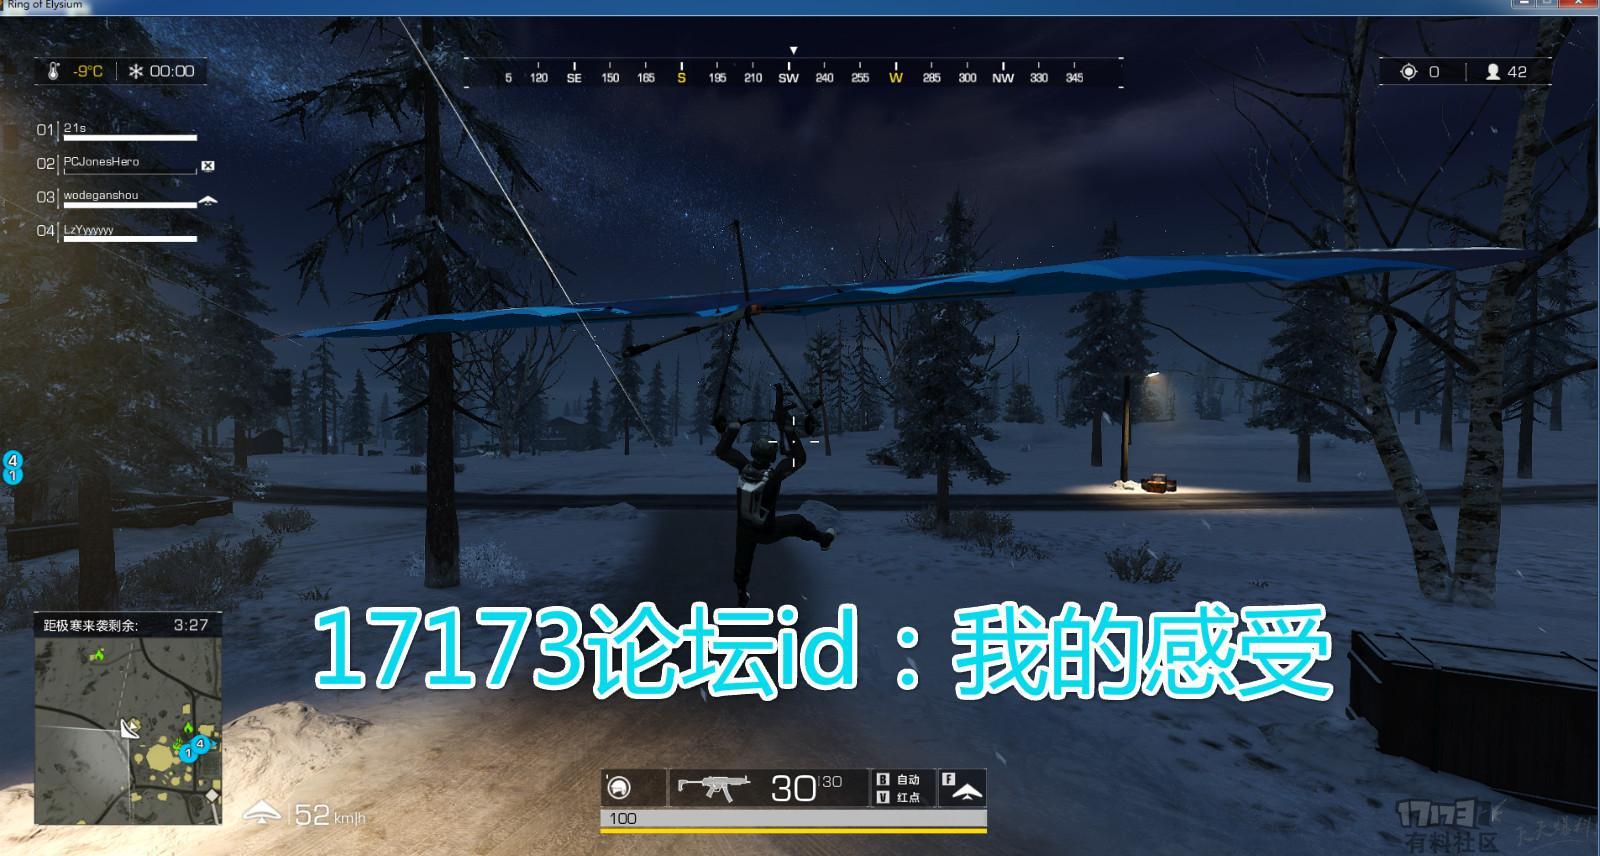 wuxianfaze1 (2)_meitu_6.jpg